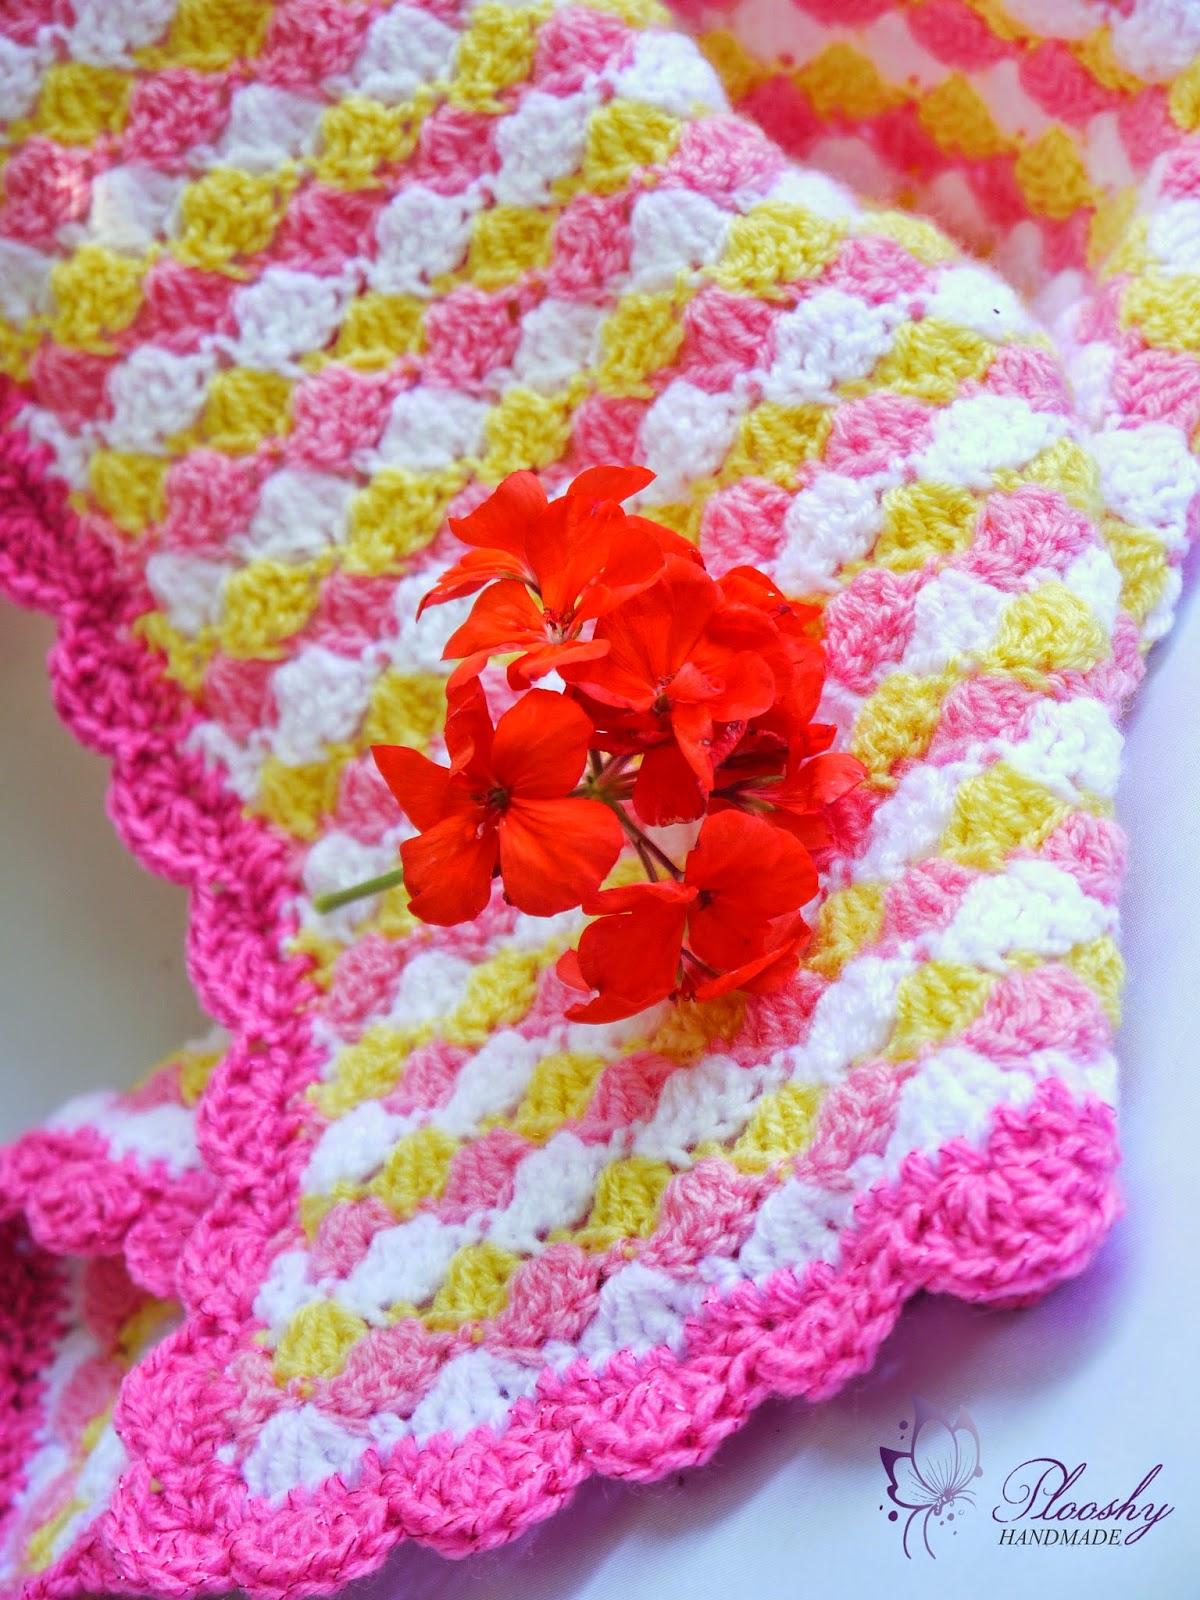 Plooshy Handmade Adorable Crochet Baby Blanket Pattern